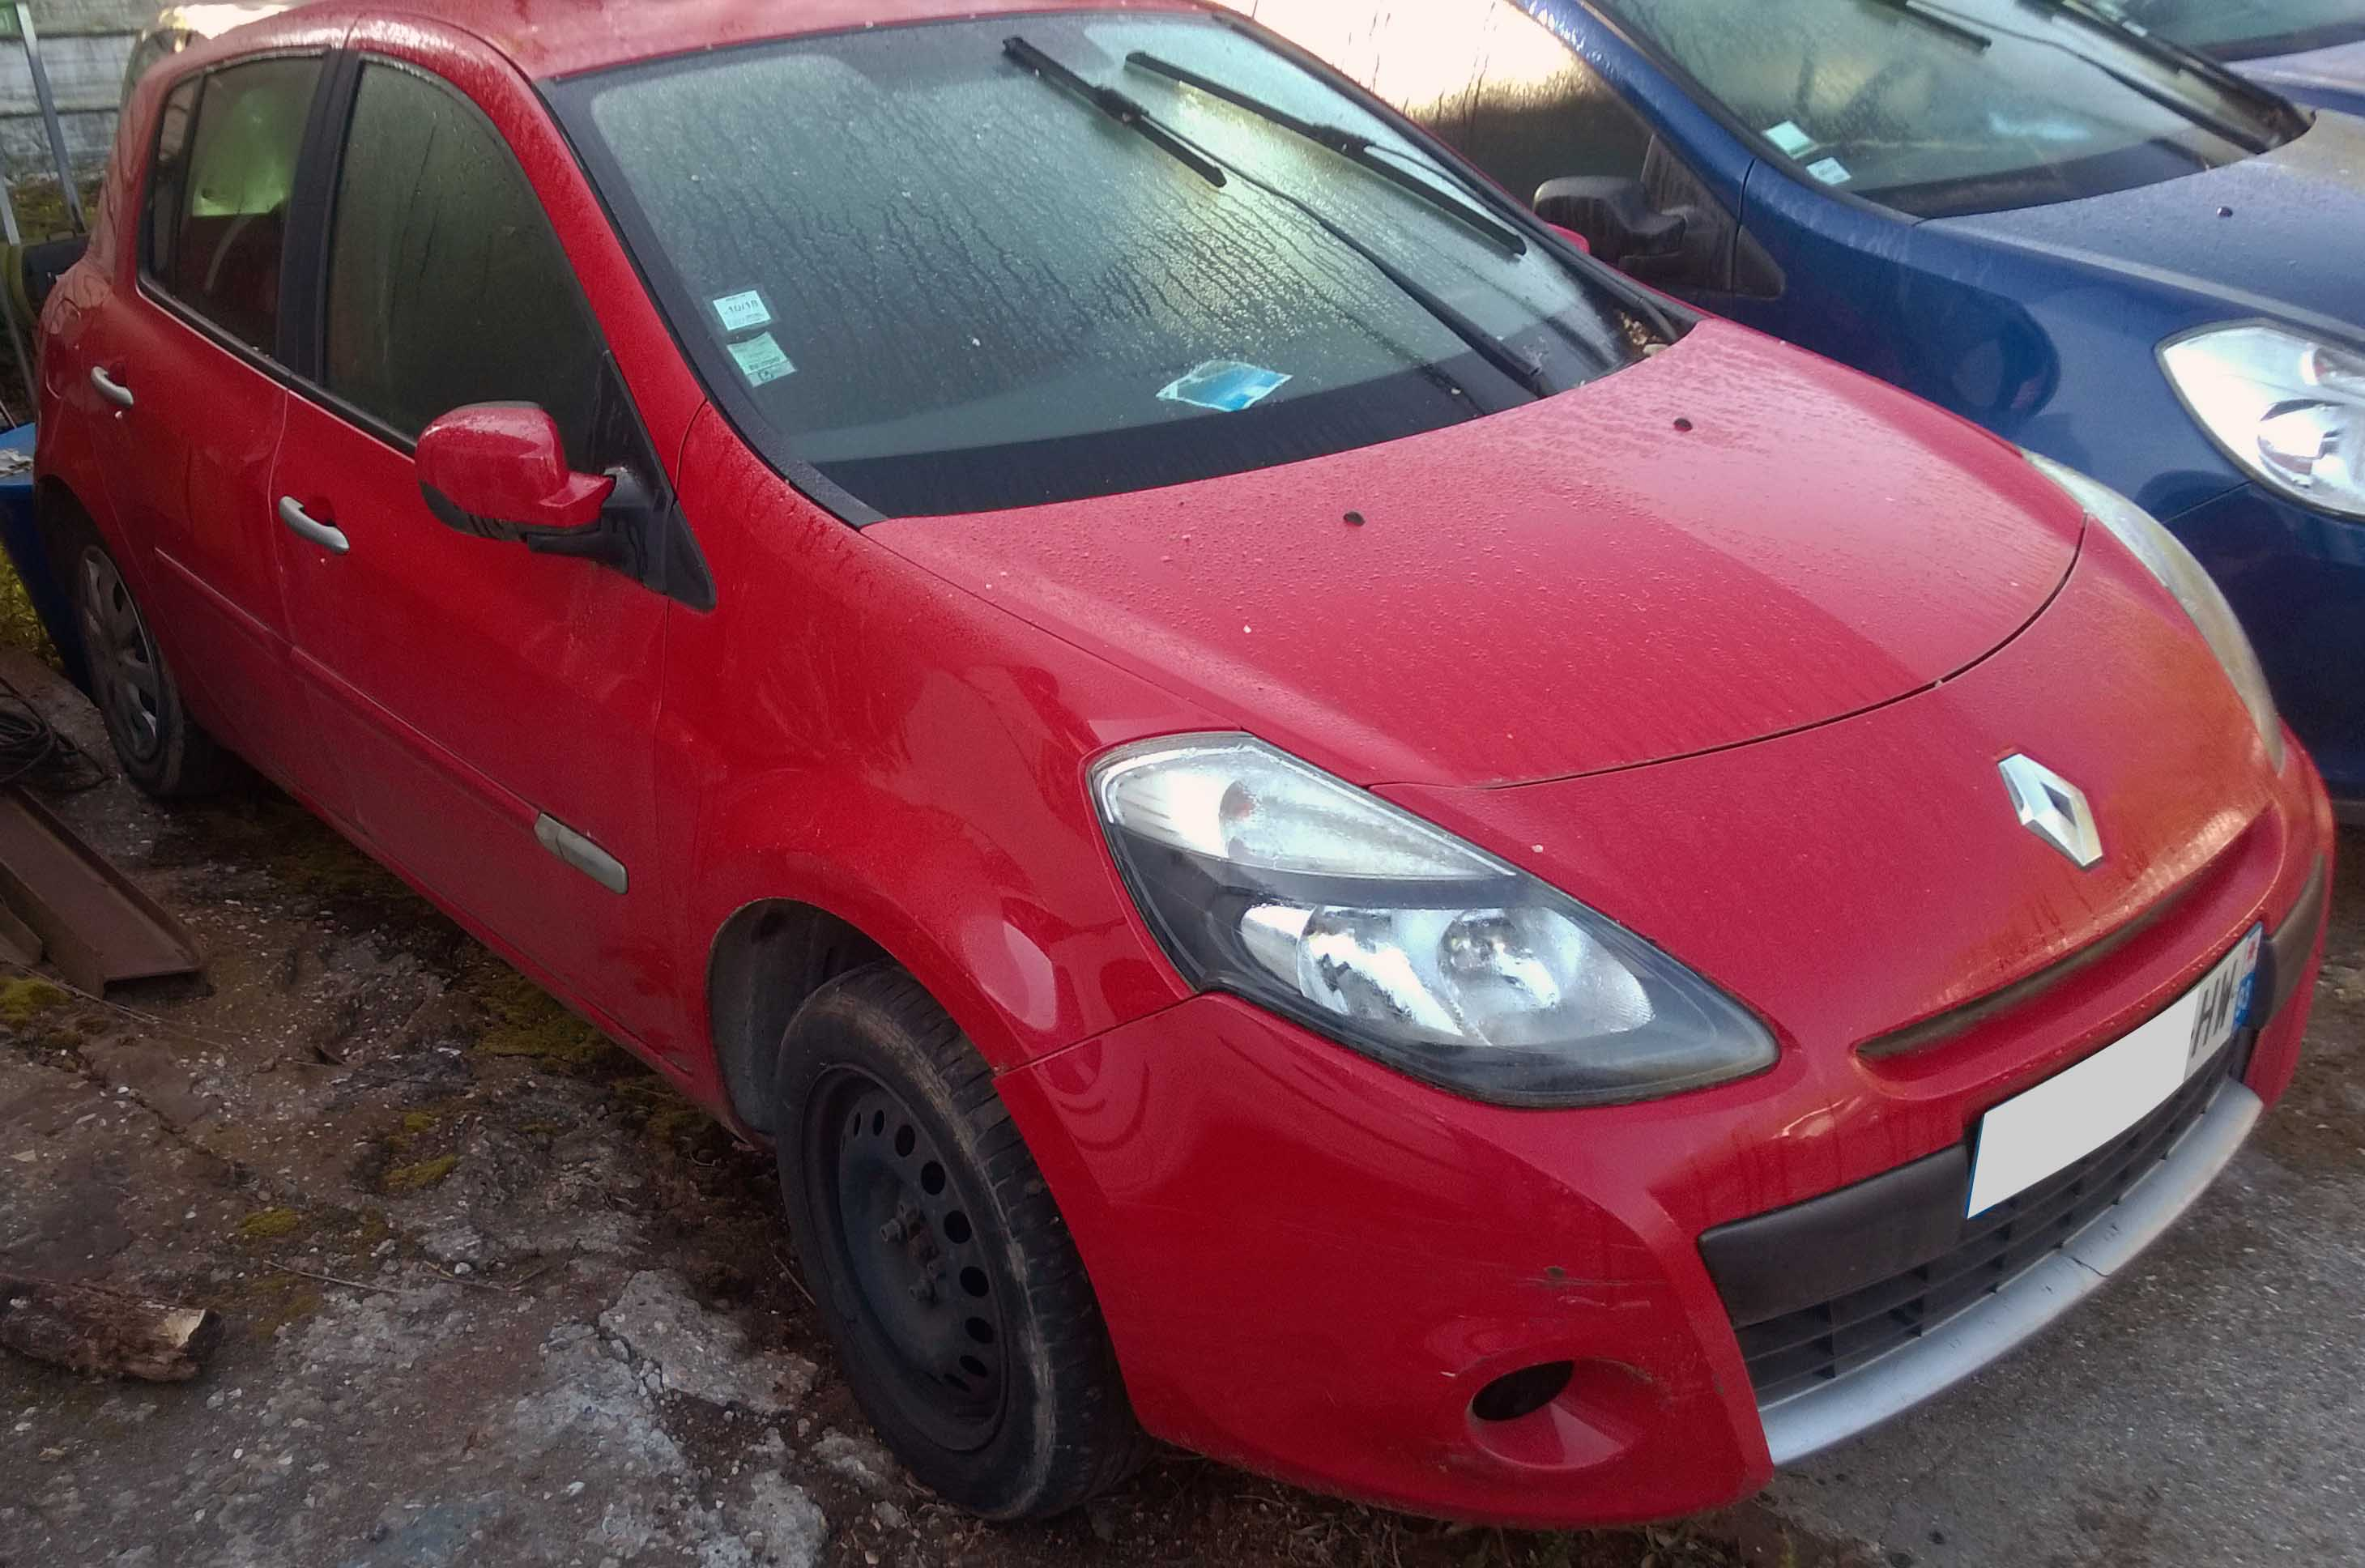 Clio rouge 1.5 DCi accidentée